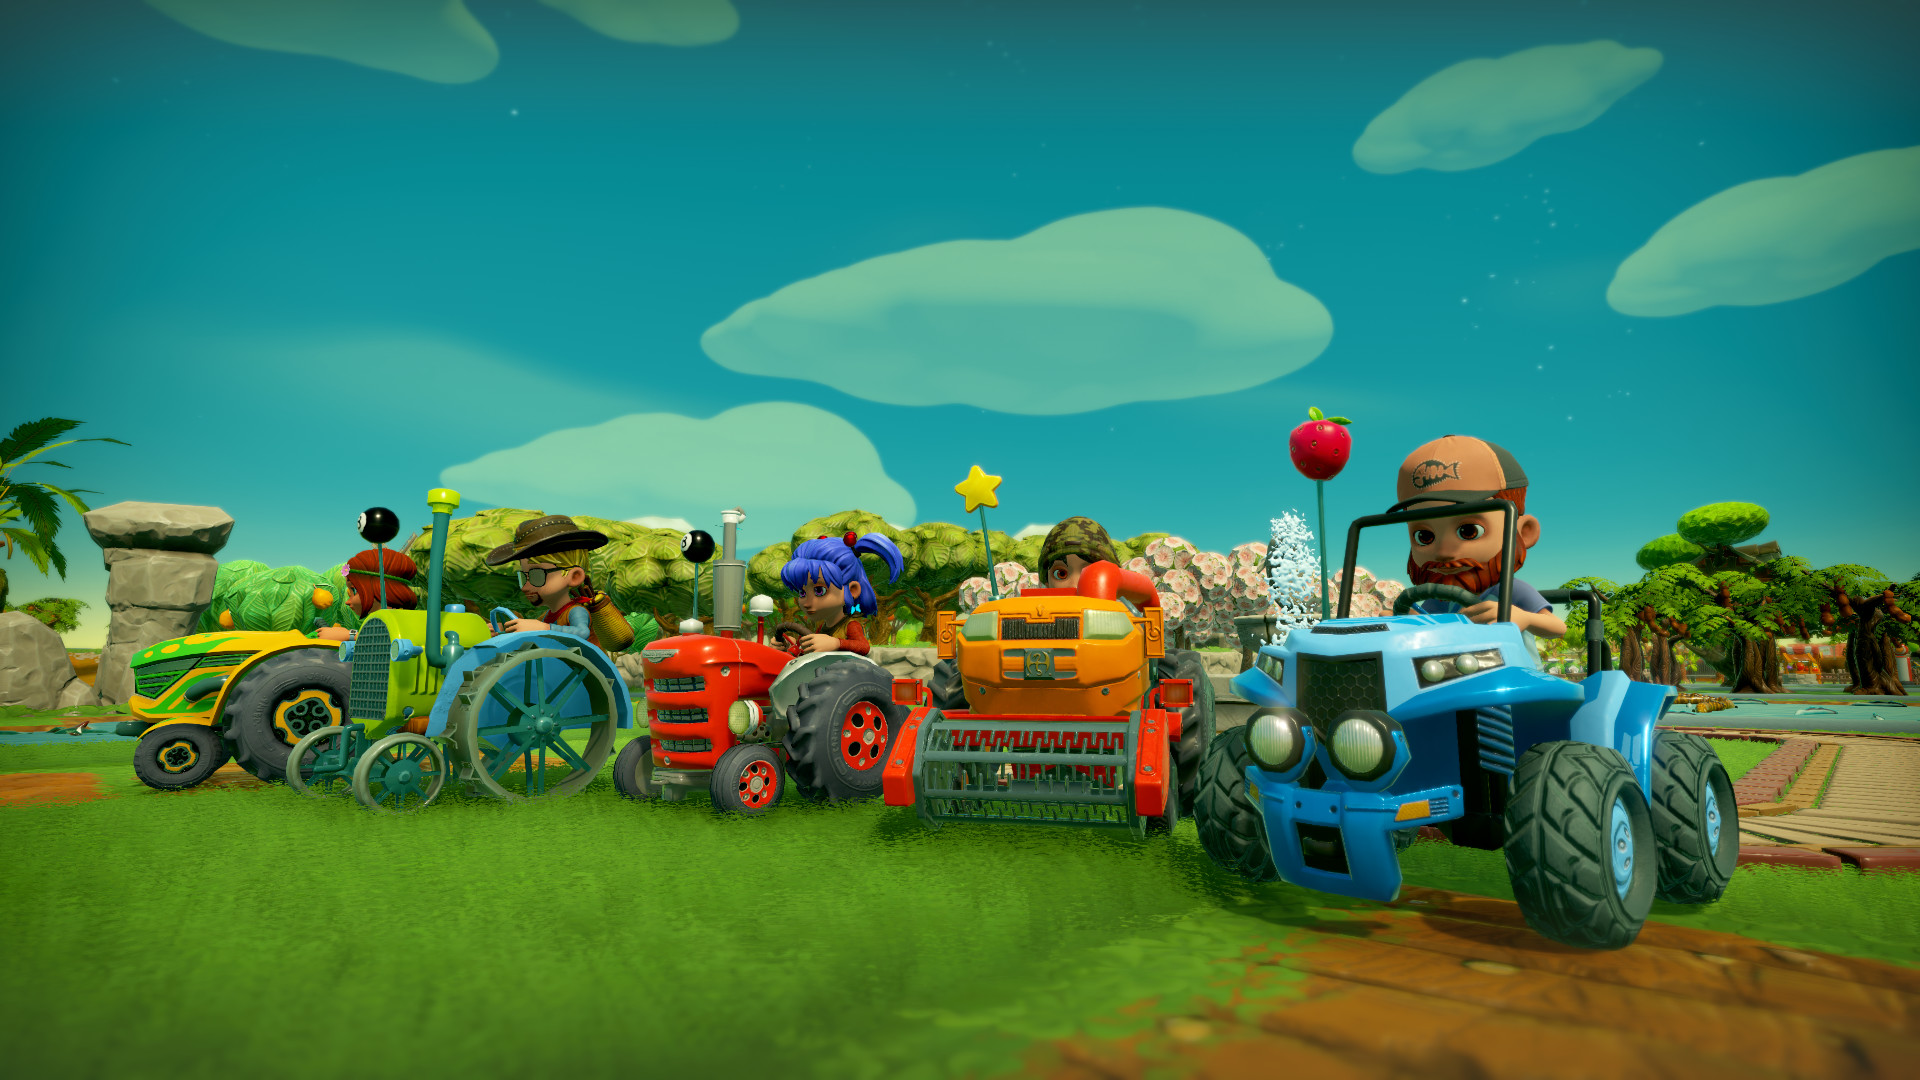 Link Tải Game Farm Together Chơi Online Miễn Phí